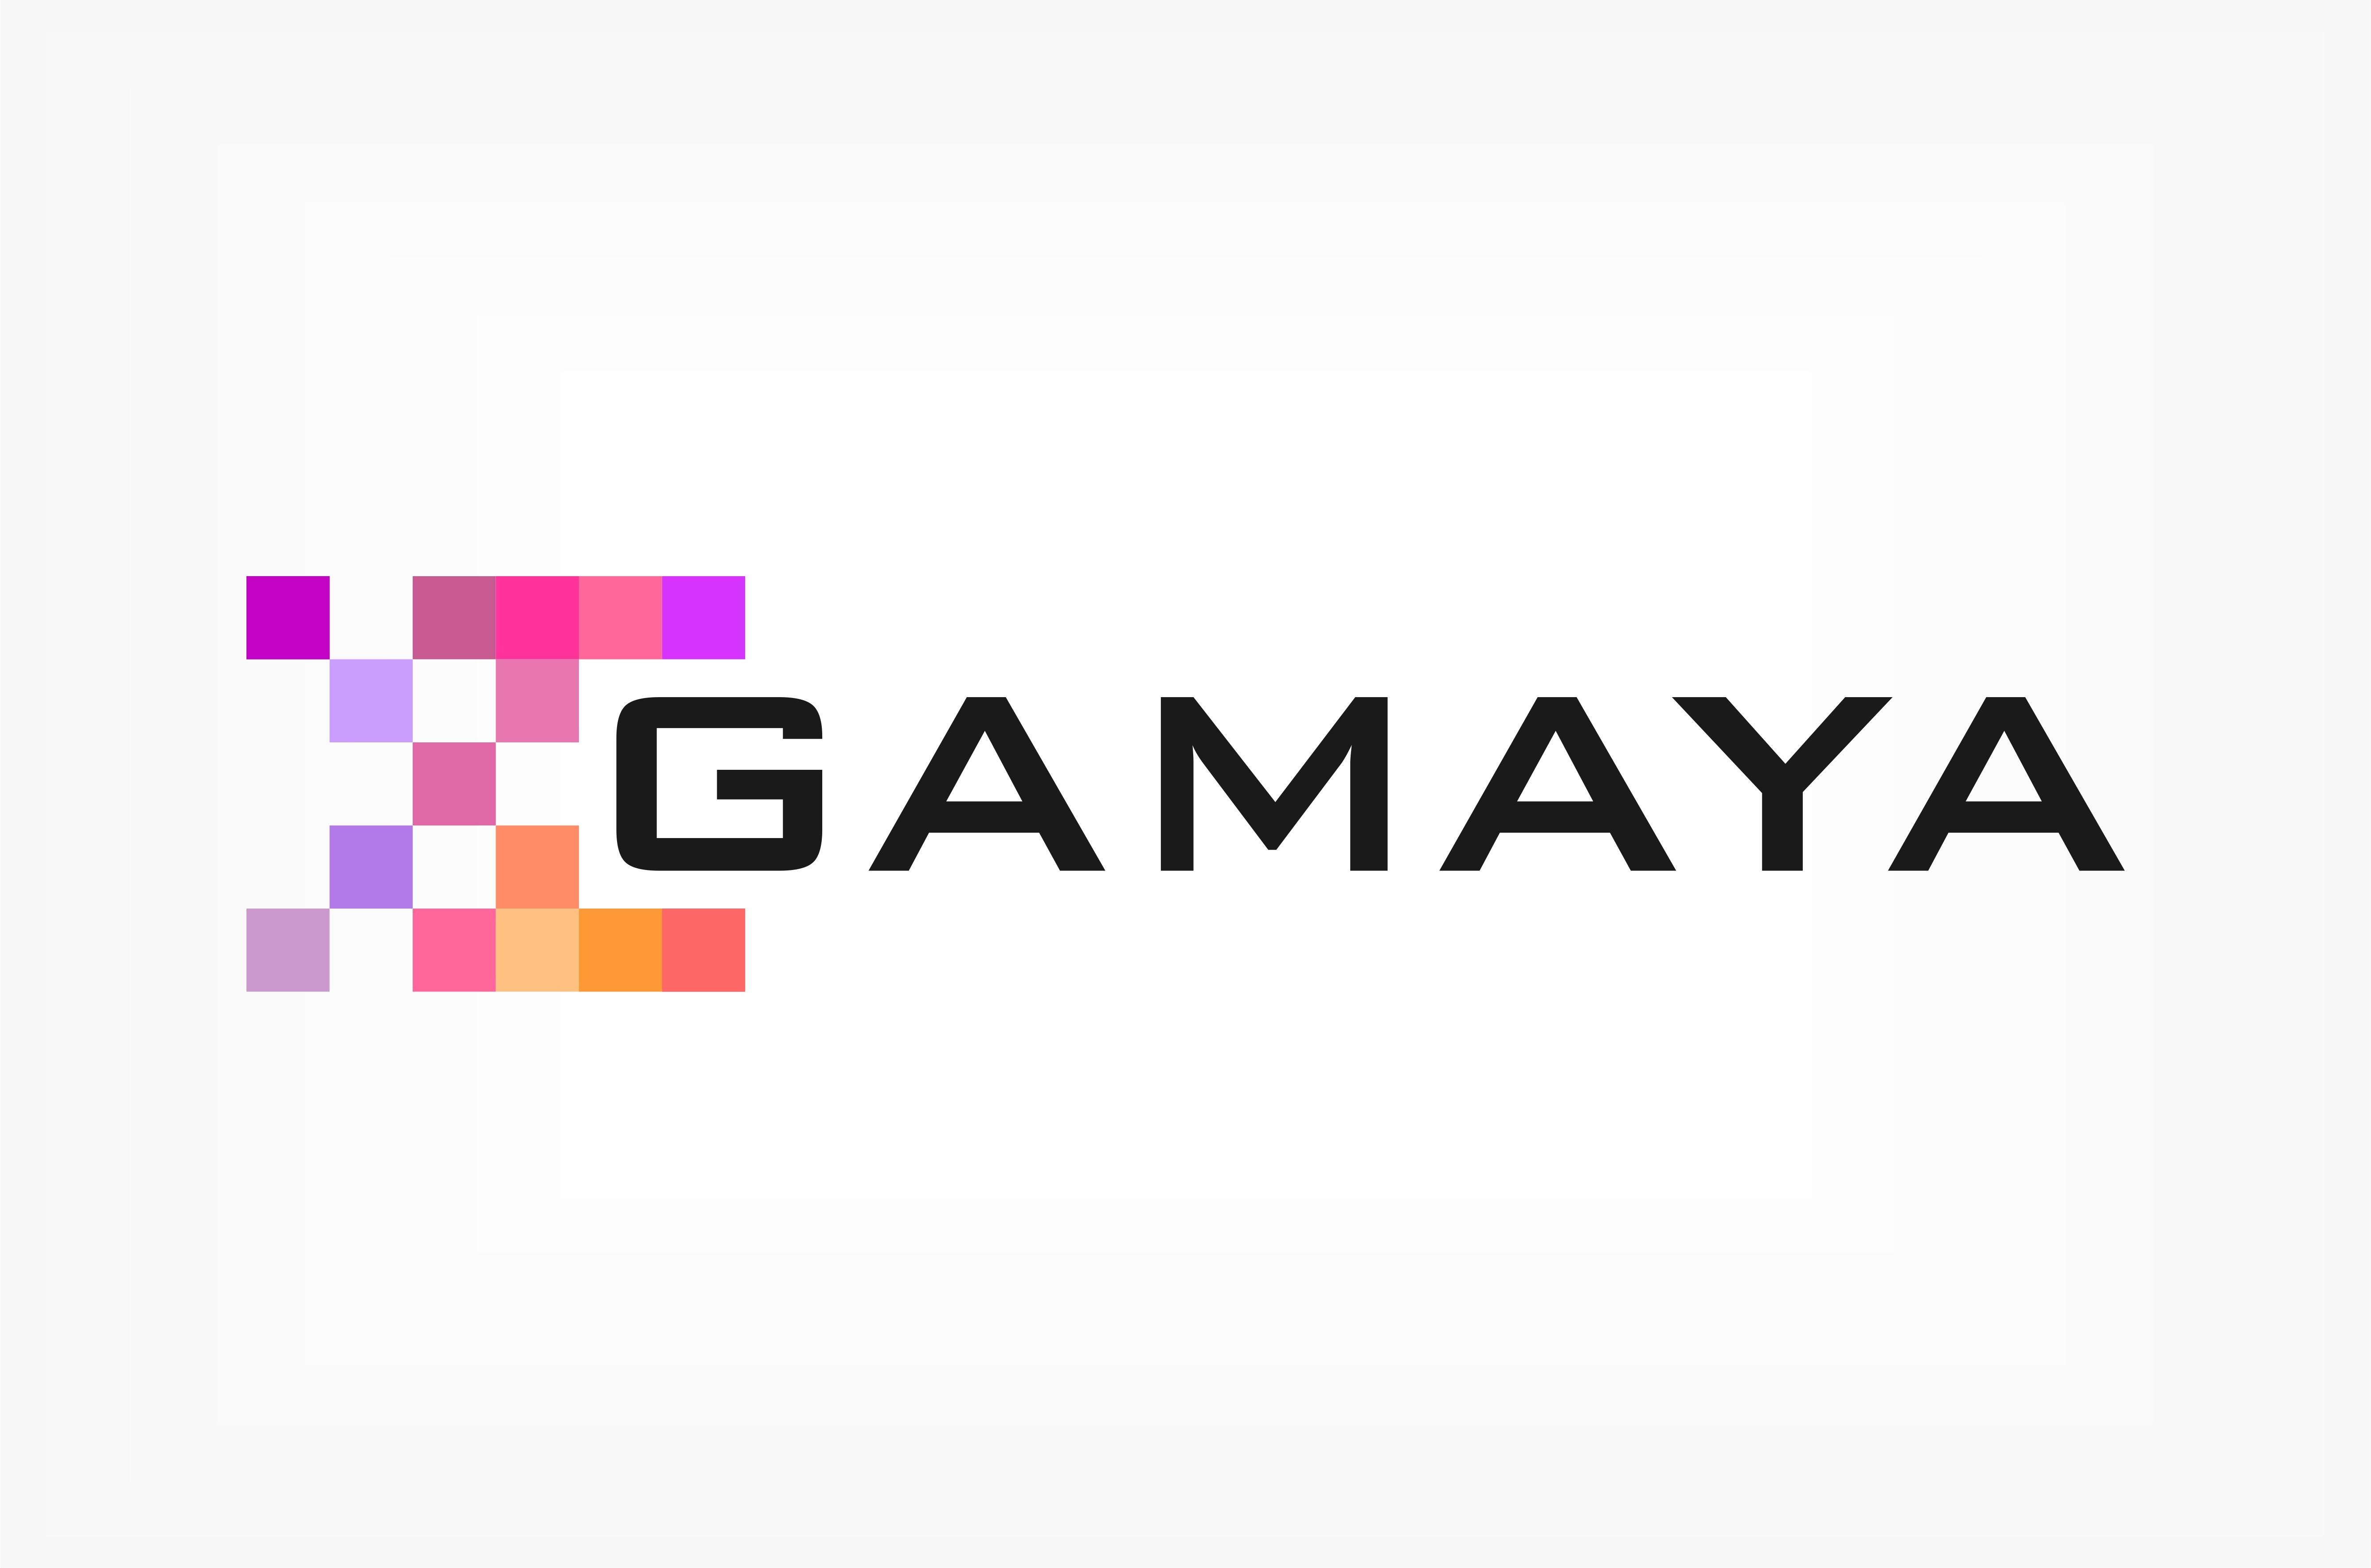 Разработка логотипа для компании Gamaya фото f_8295486170ea44af.jpg